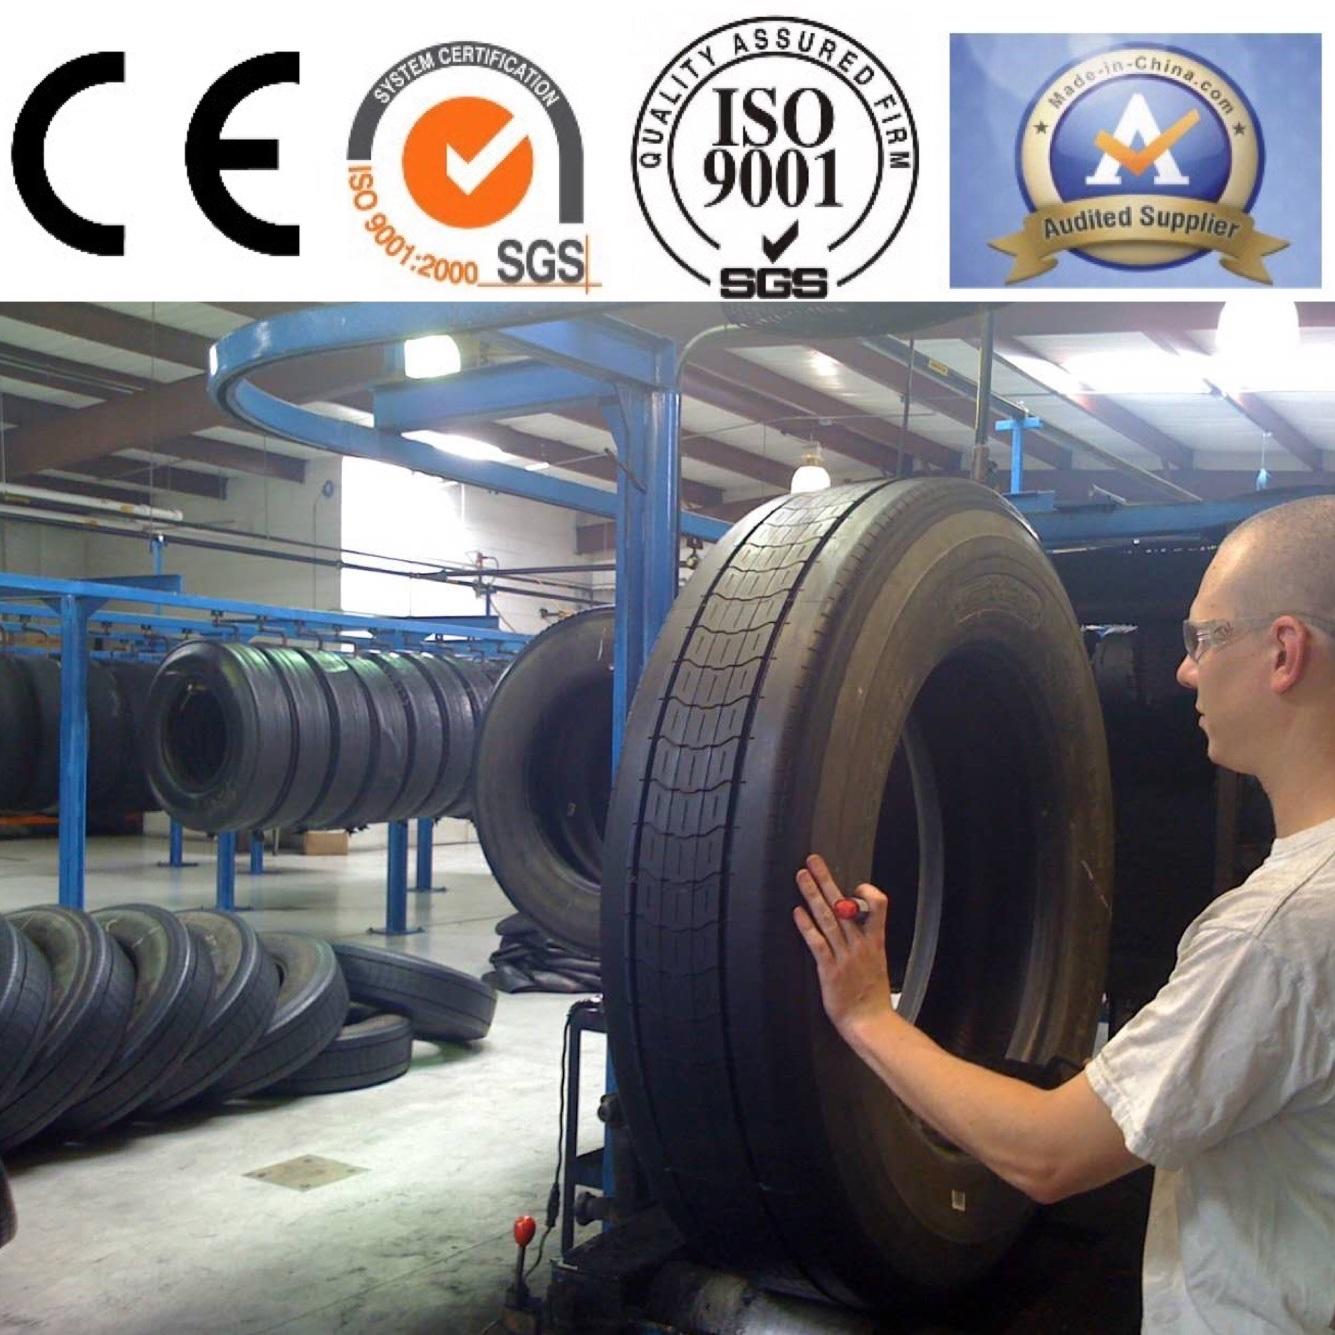 Retreading Tyres by Vulcanising Equipment